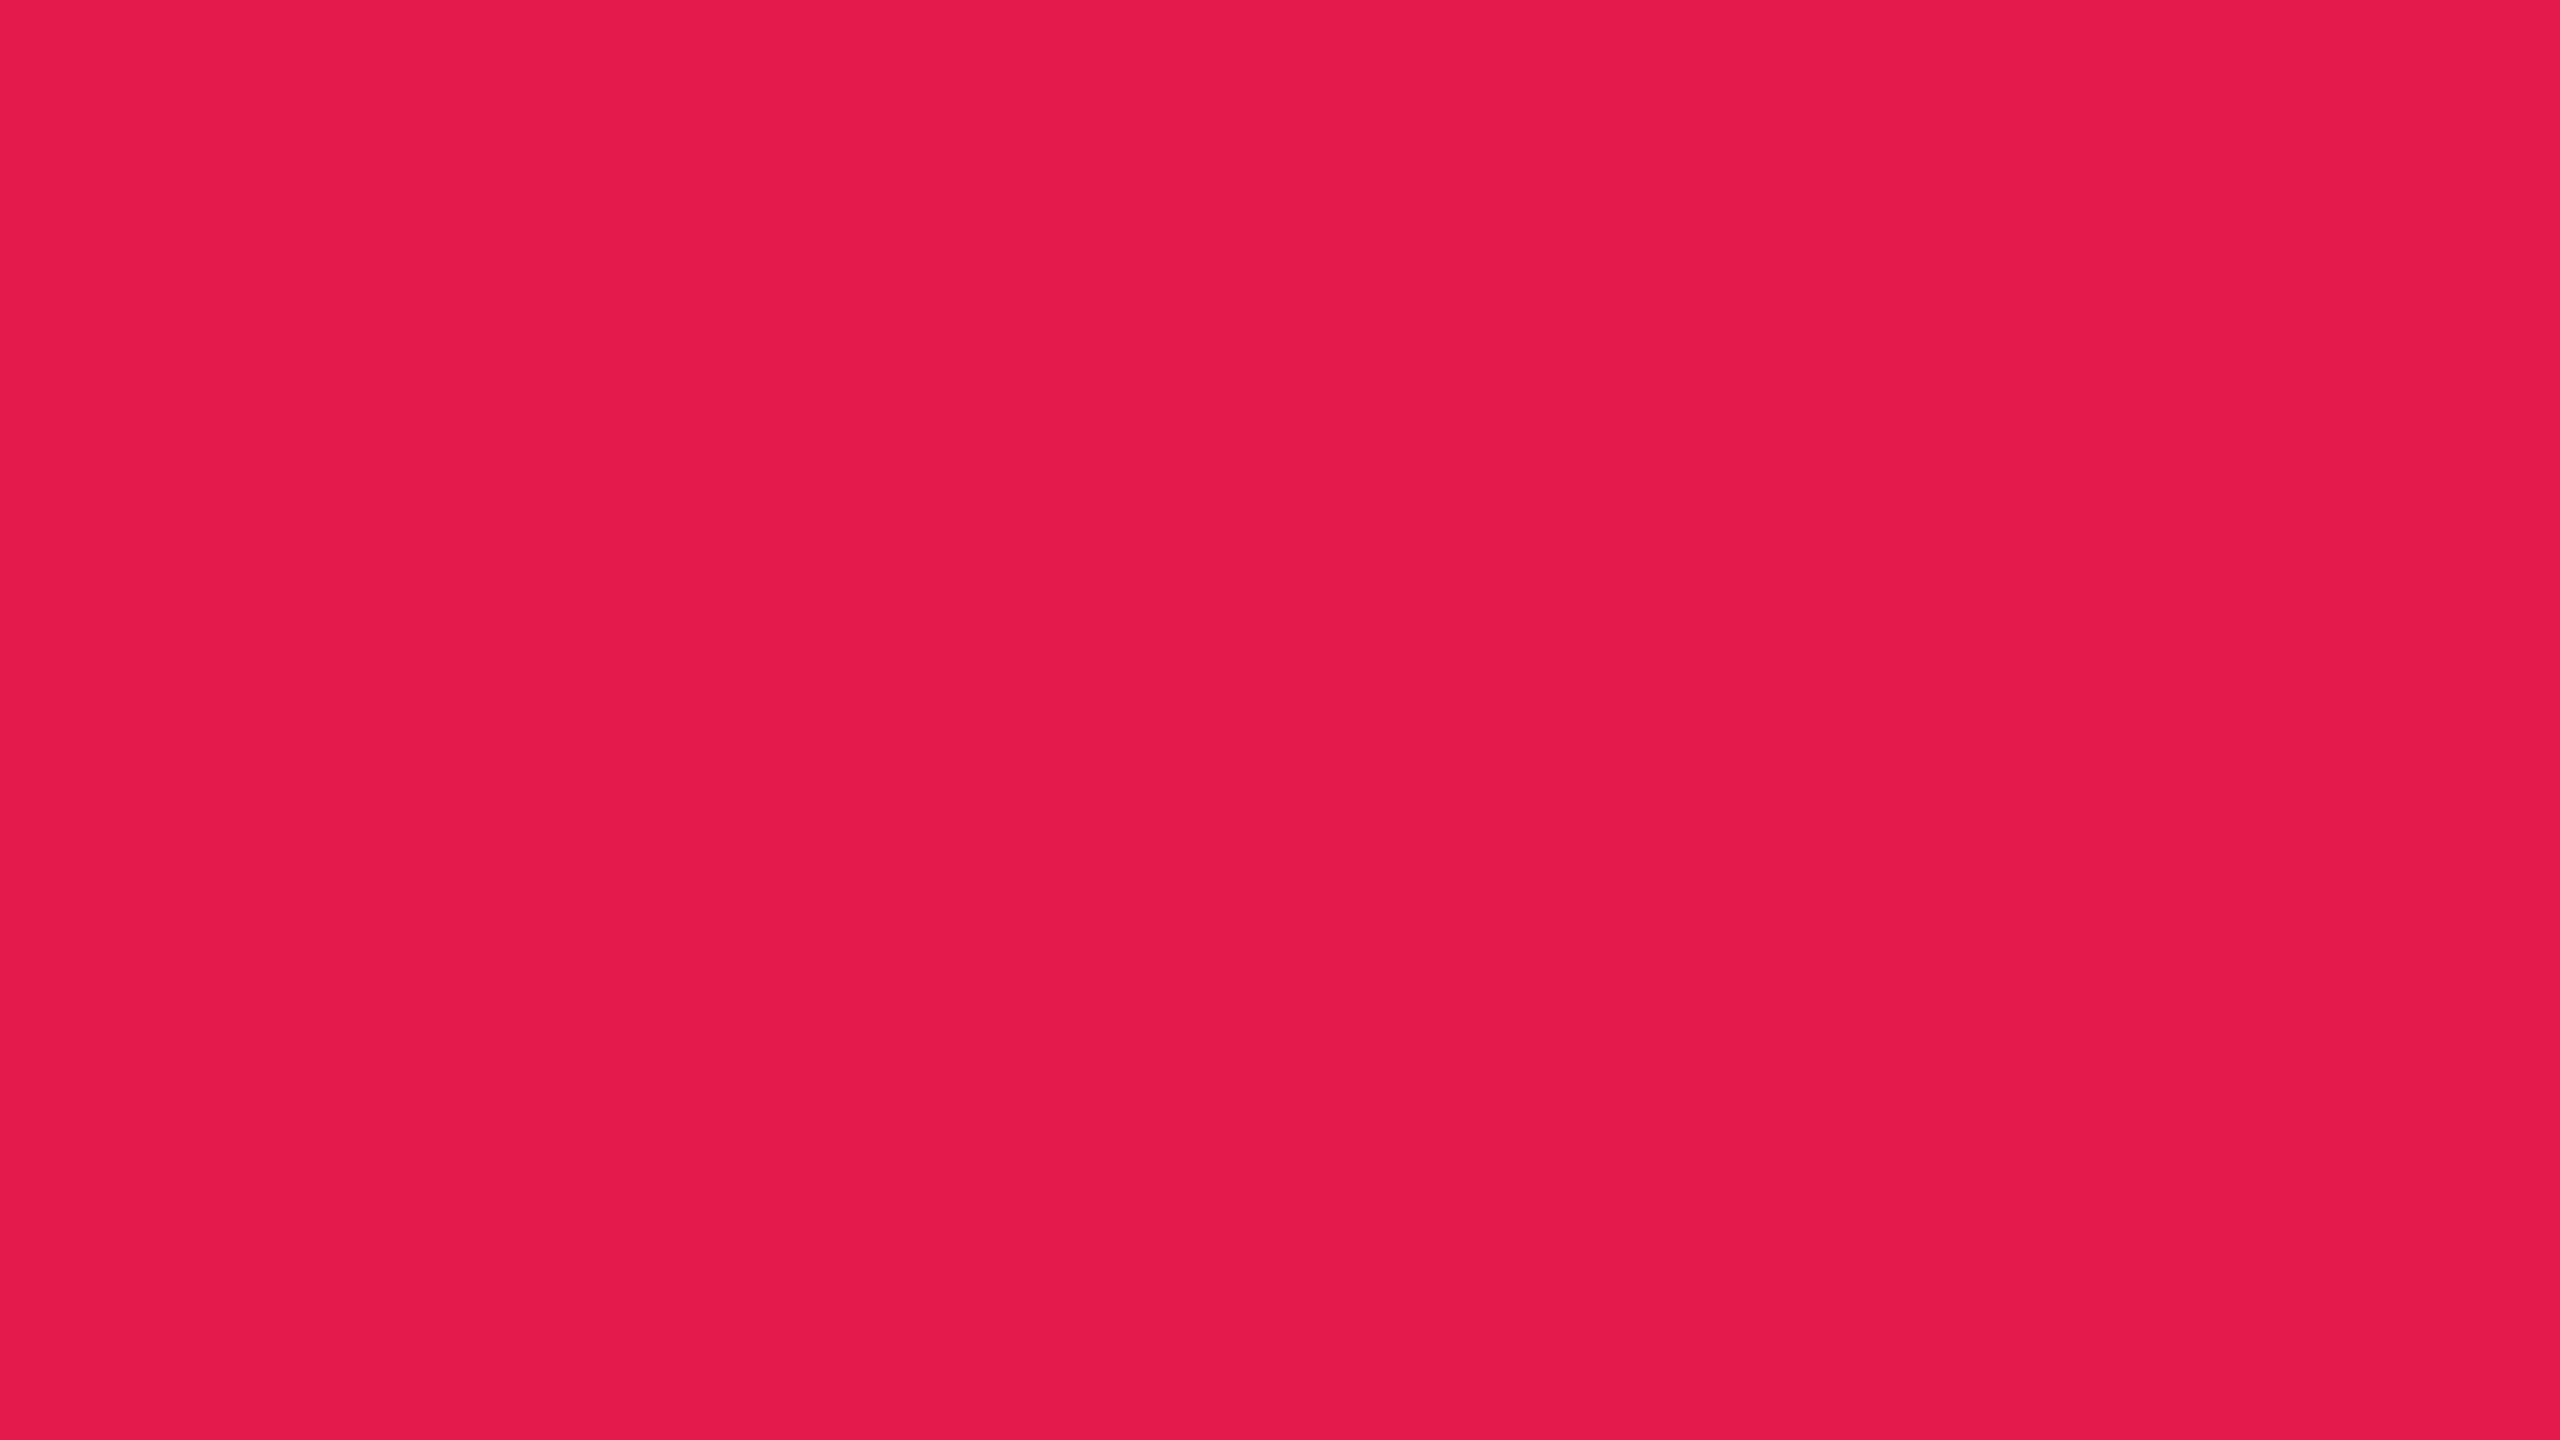 2560x1440 Spanish Crimson Solid Color Background